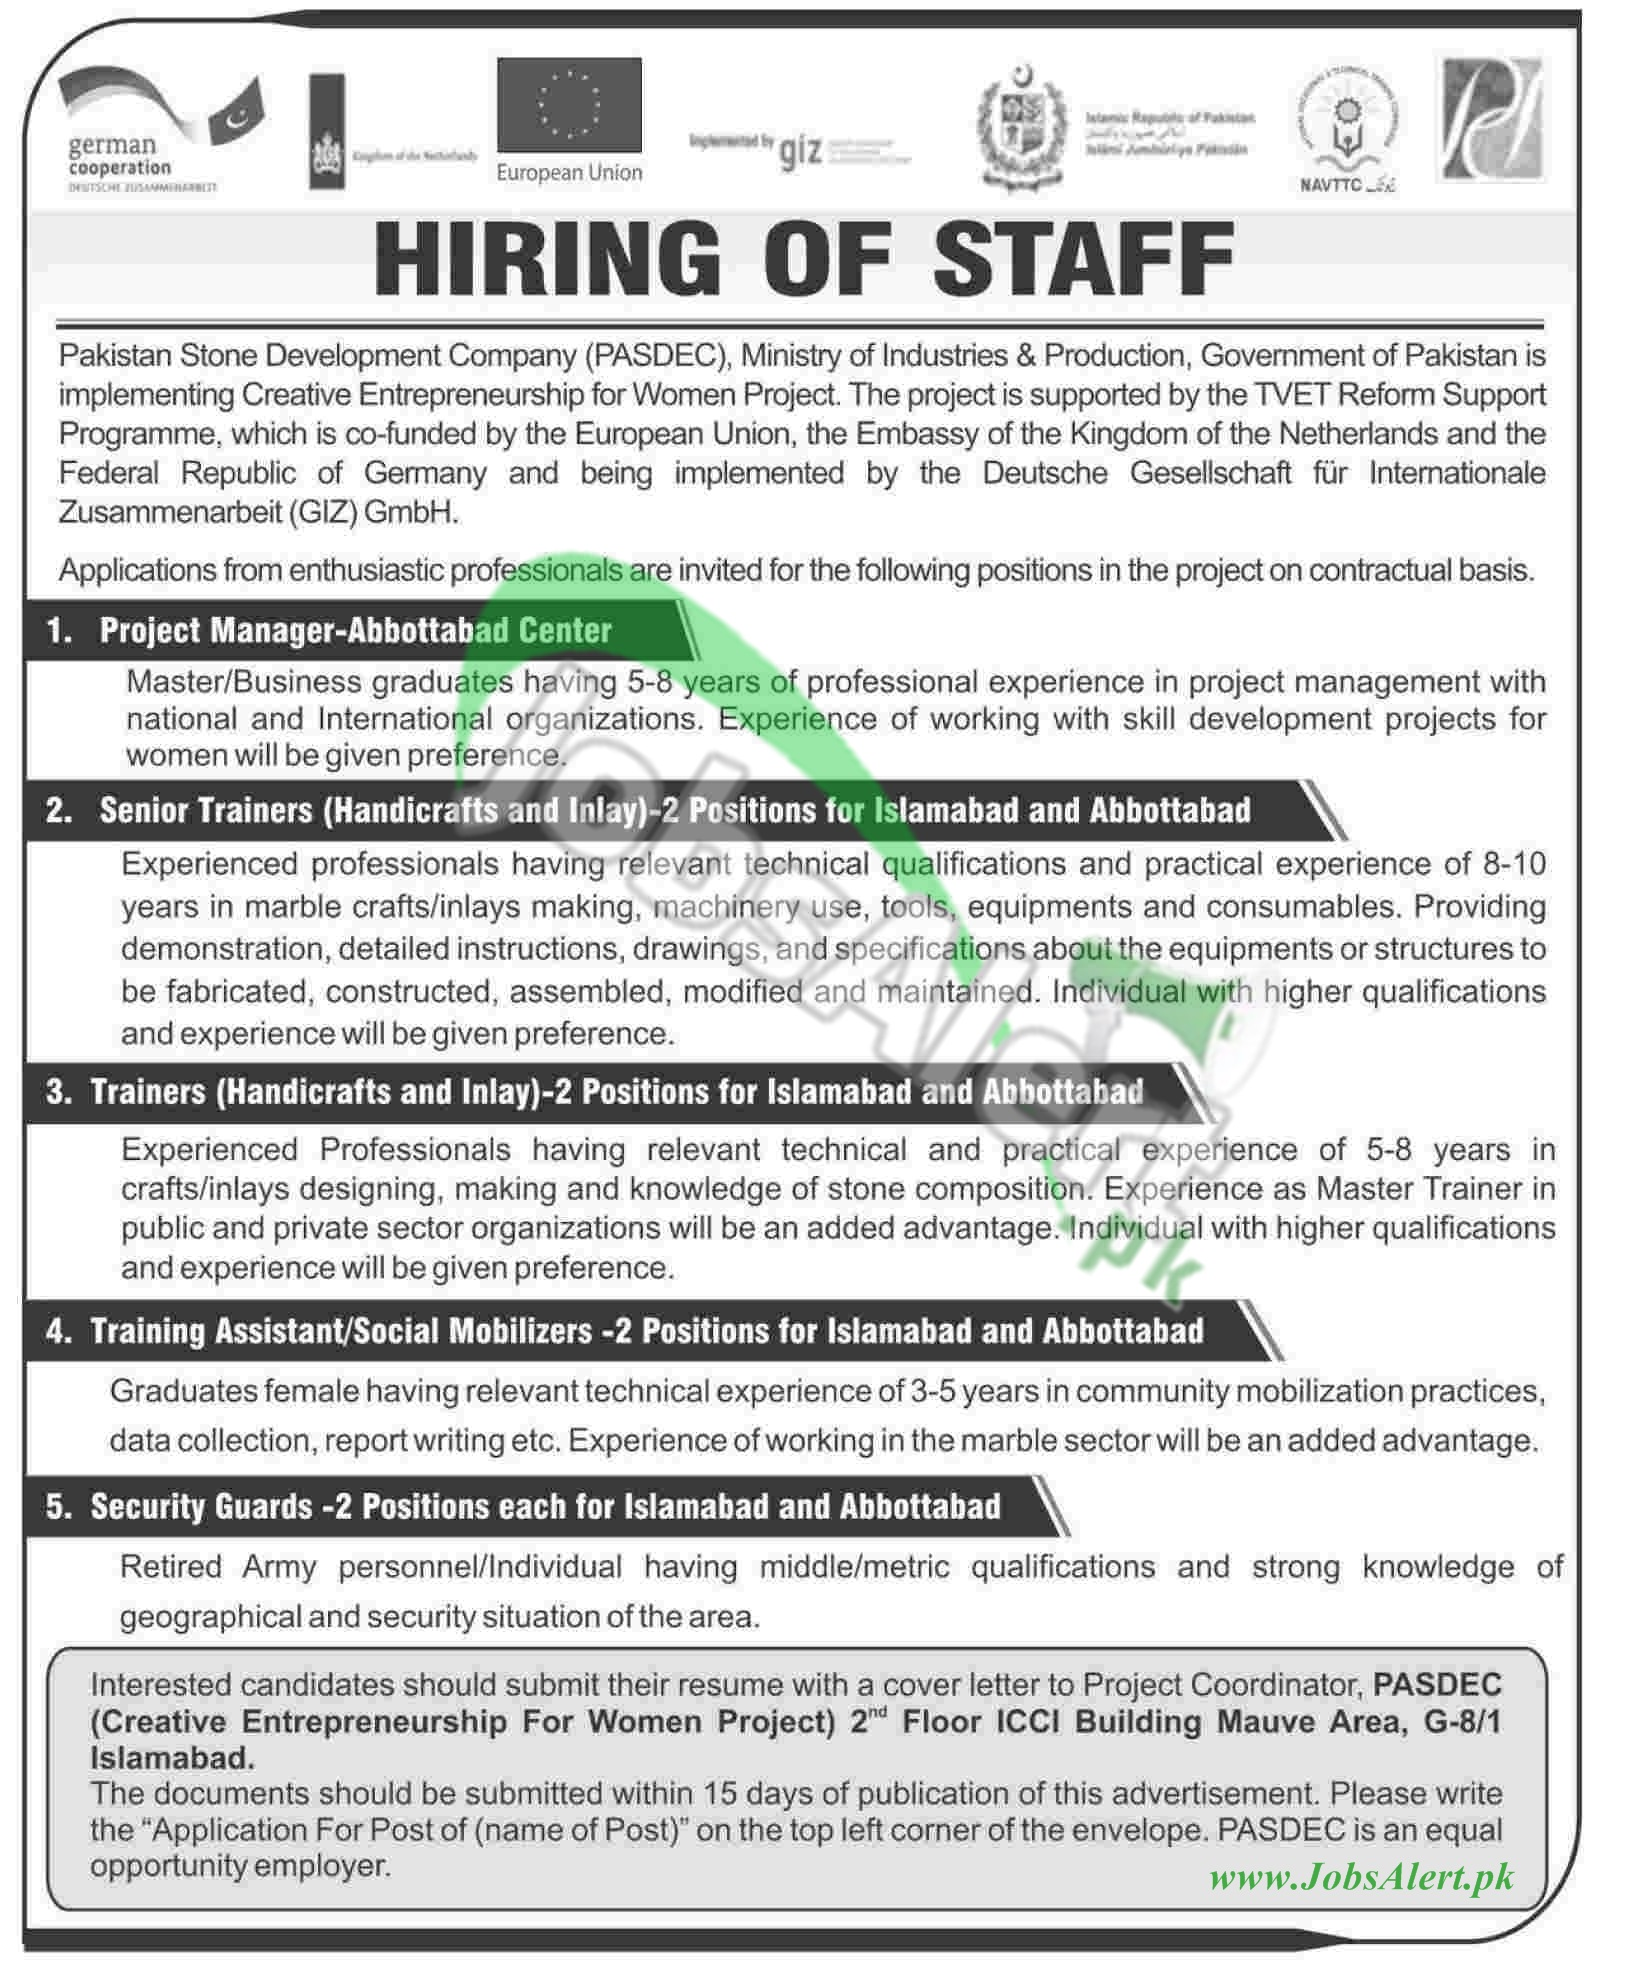 Pakistan Stone Development Company (PASDEC)